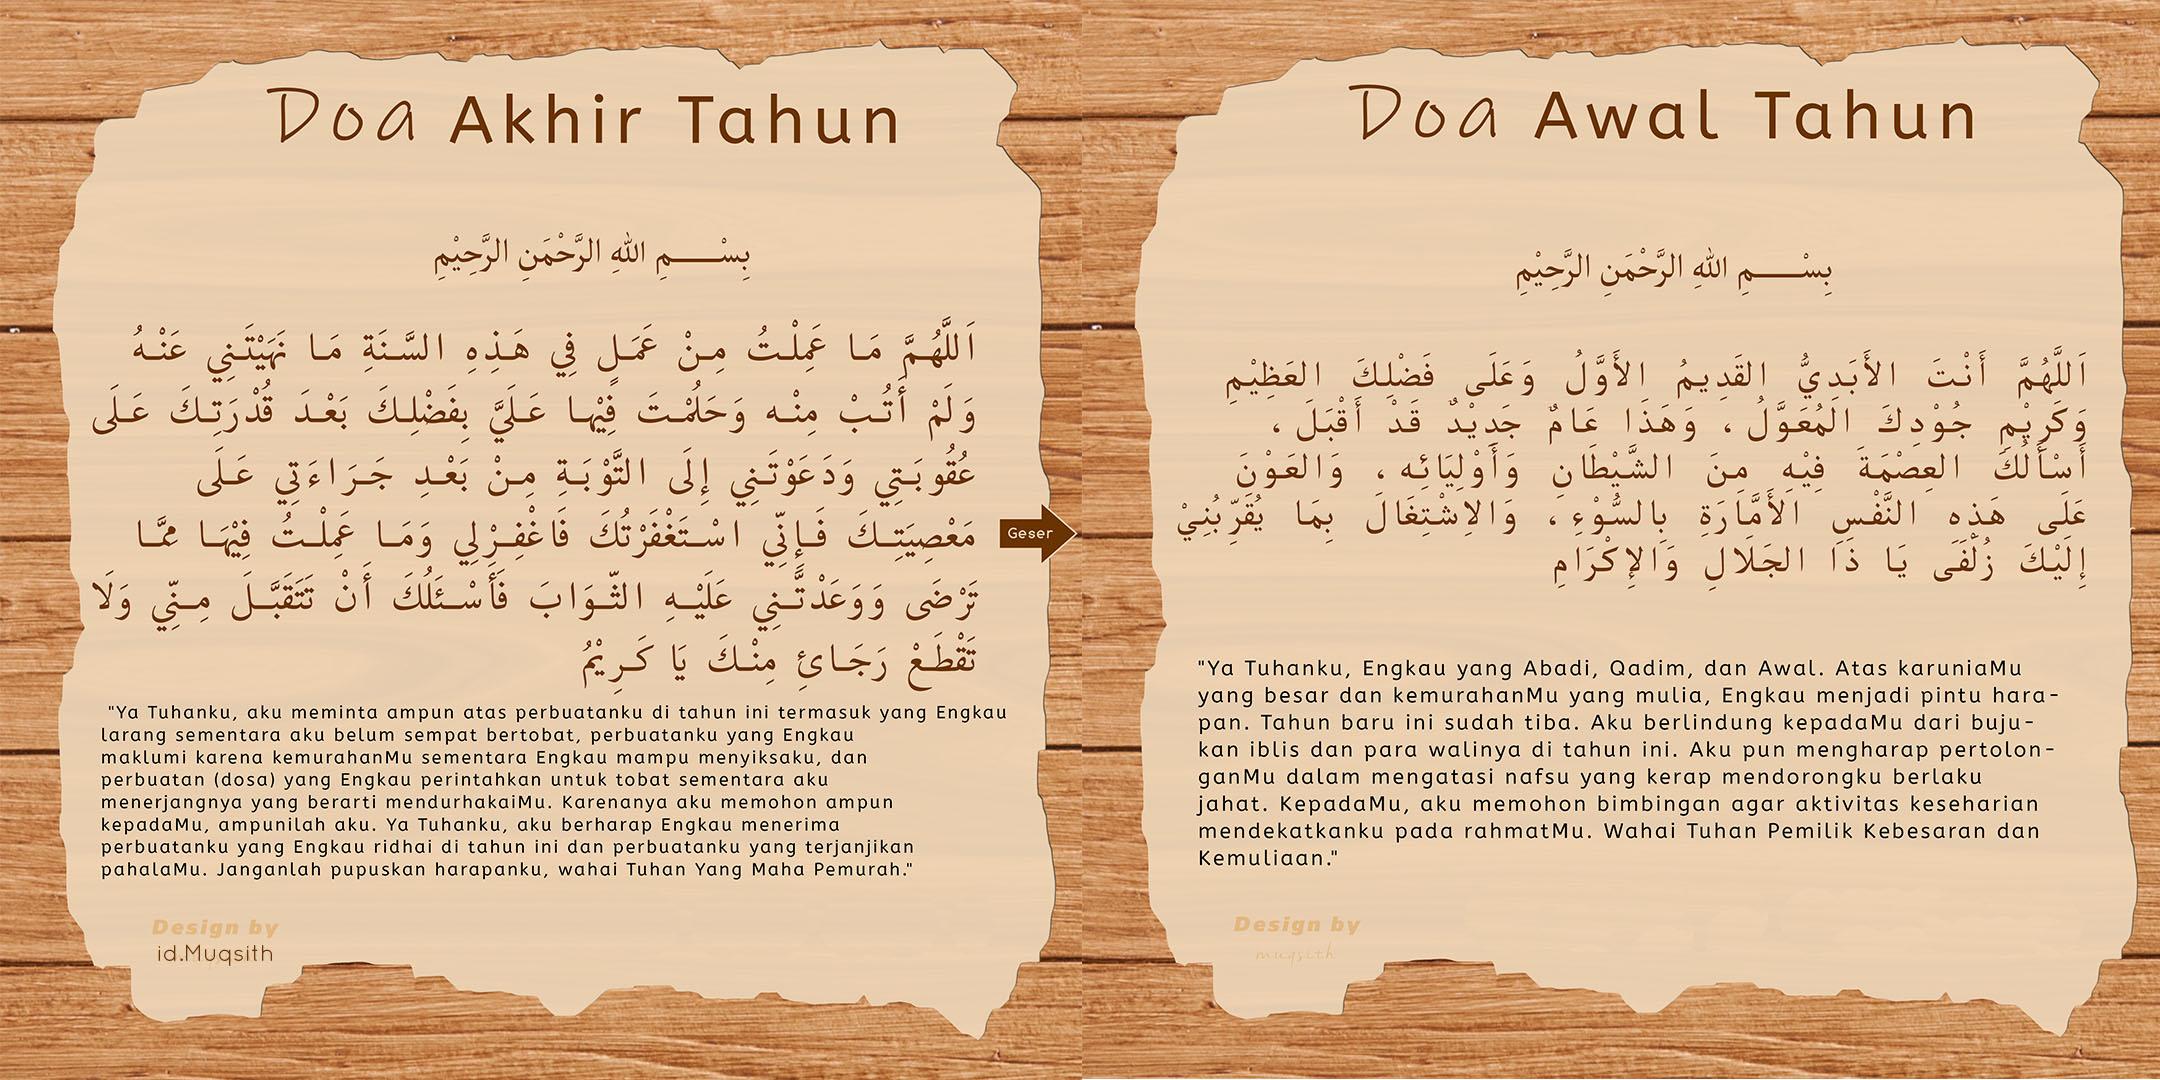 Doa Awal dan Akhir Tahun Lengkap Dengan Terjemaah Juga Bahasa Arab